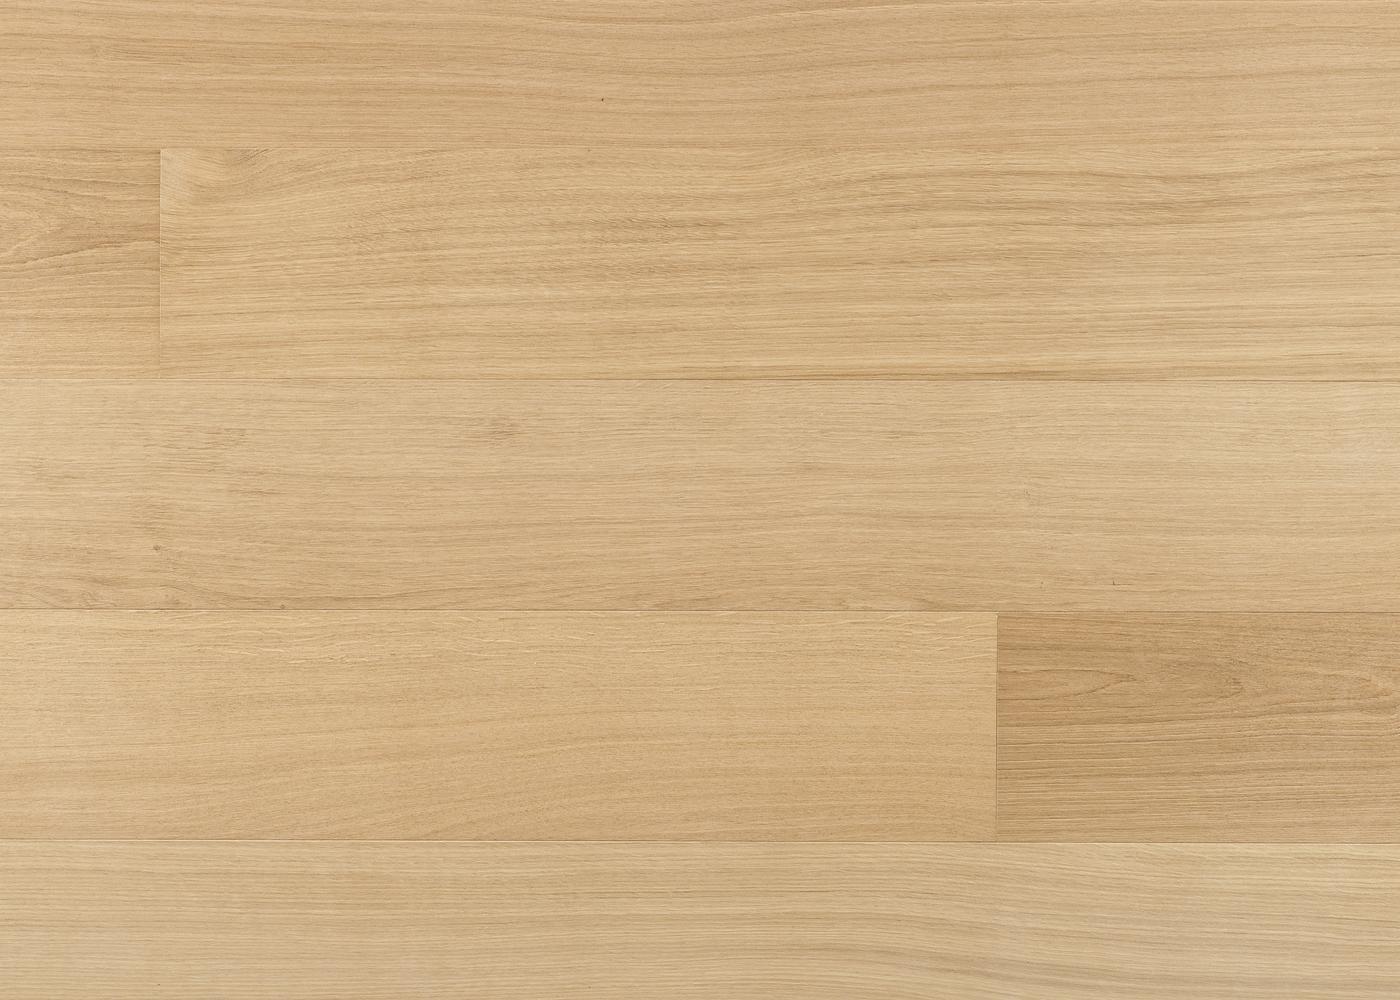 Parquet chêne contrecollé TALLINN brossé huile UV Select support CP 10x150x1940